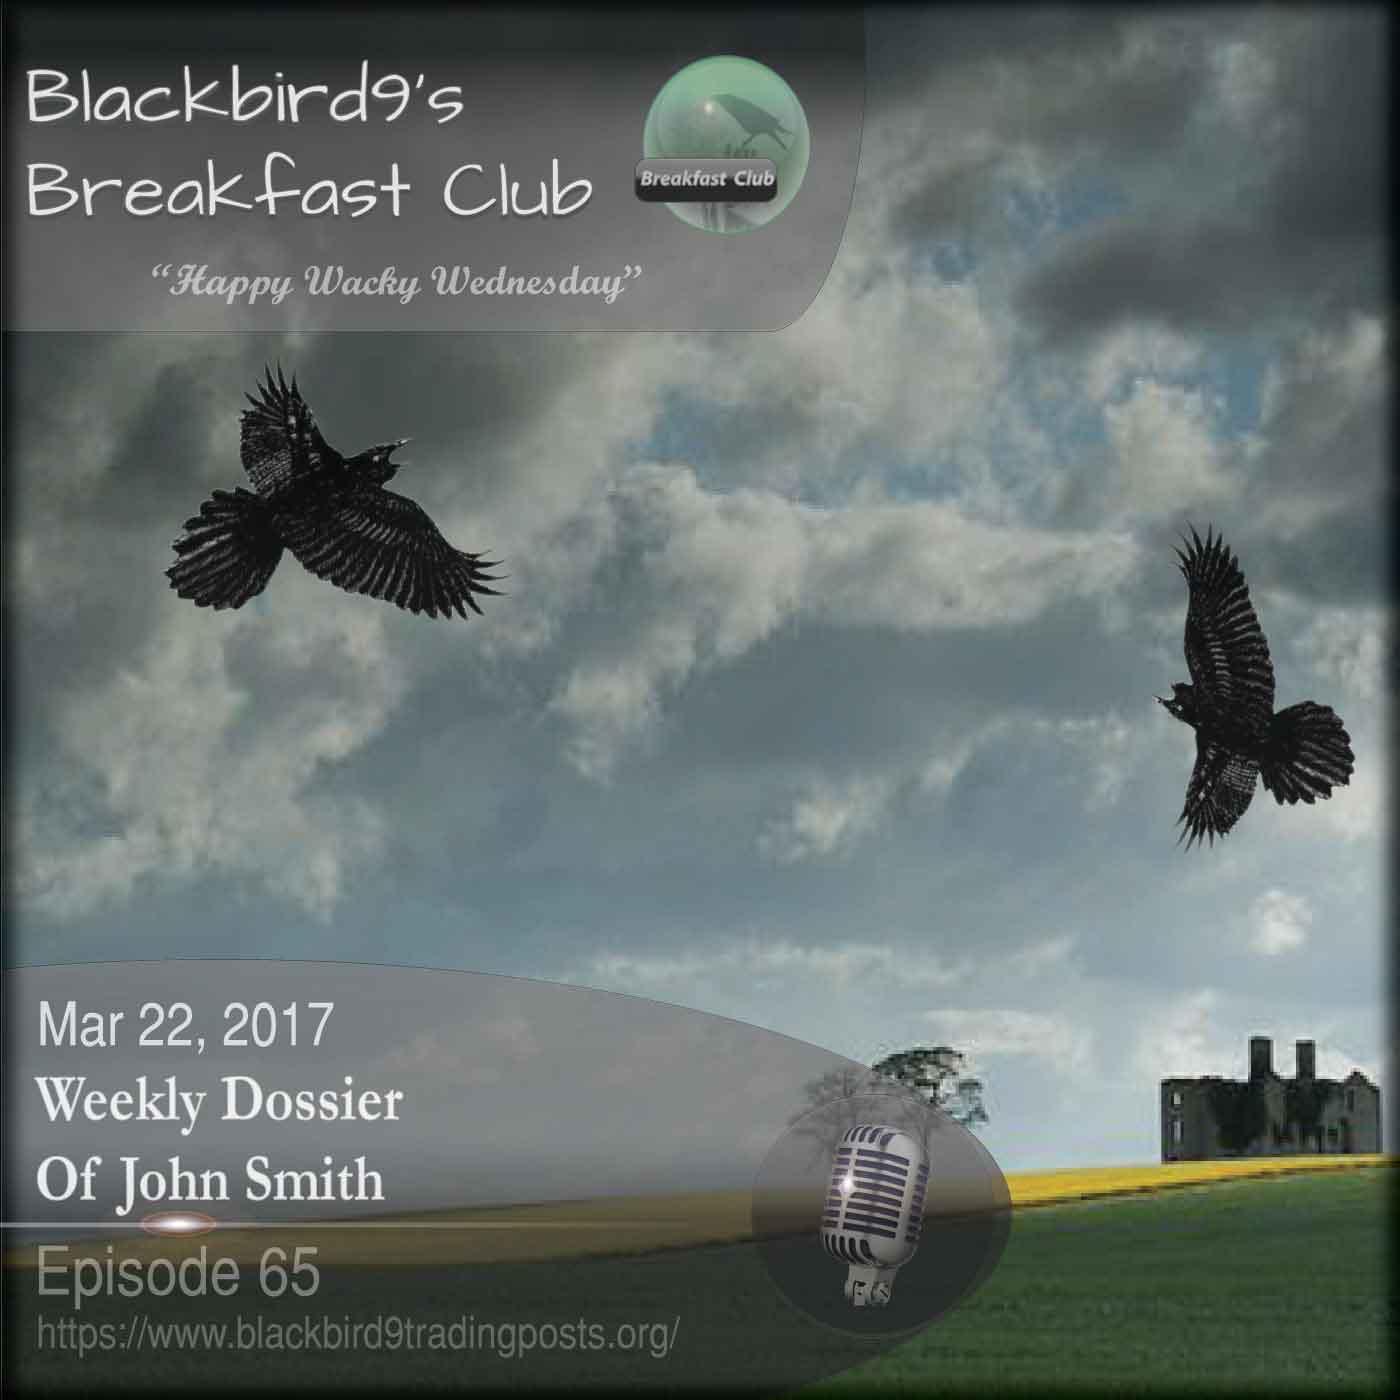 Weekly Dossier Of John Smith - Blackbird9